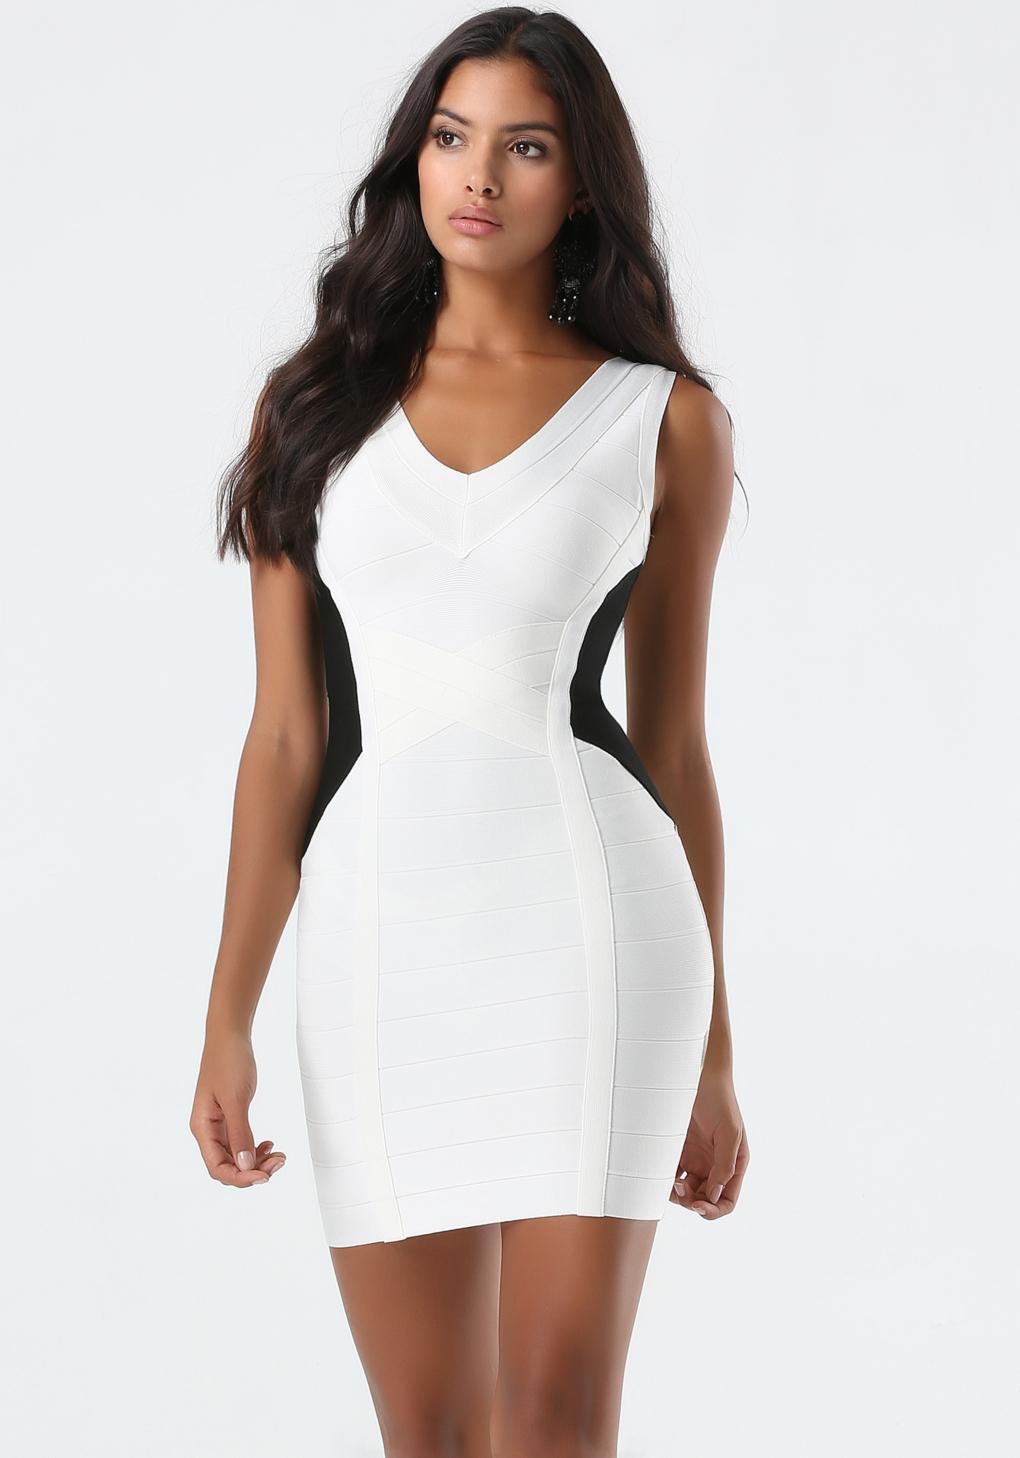 30b7b0d29eba29 Bebe Black & White Bandage Dress in White - Lyst